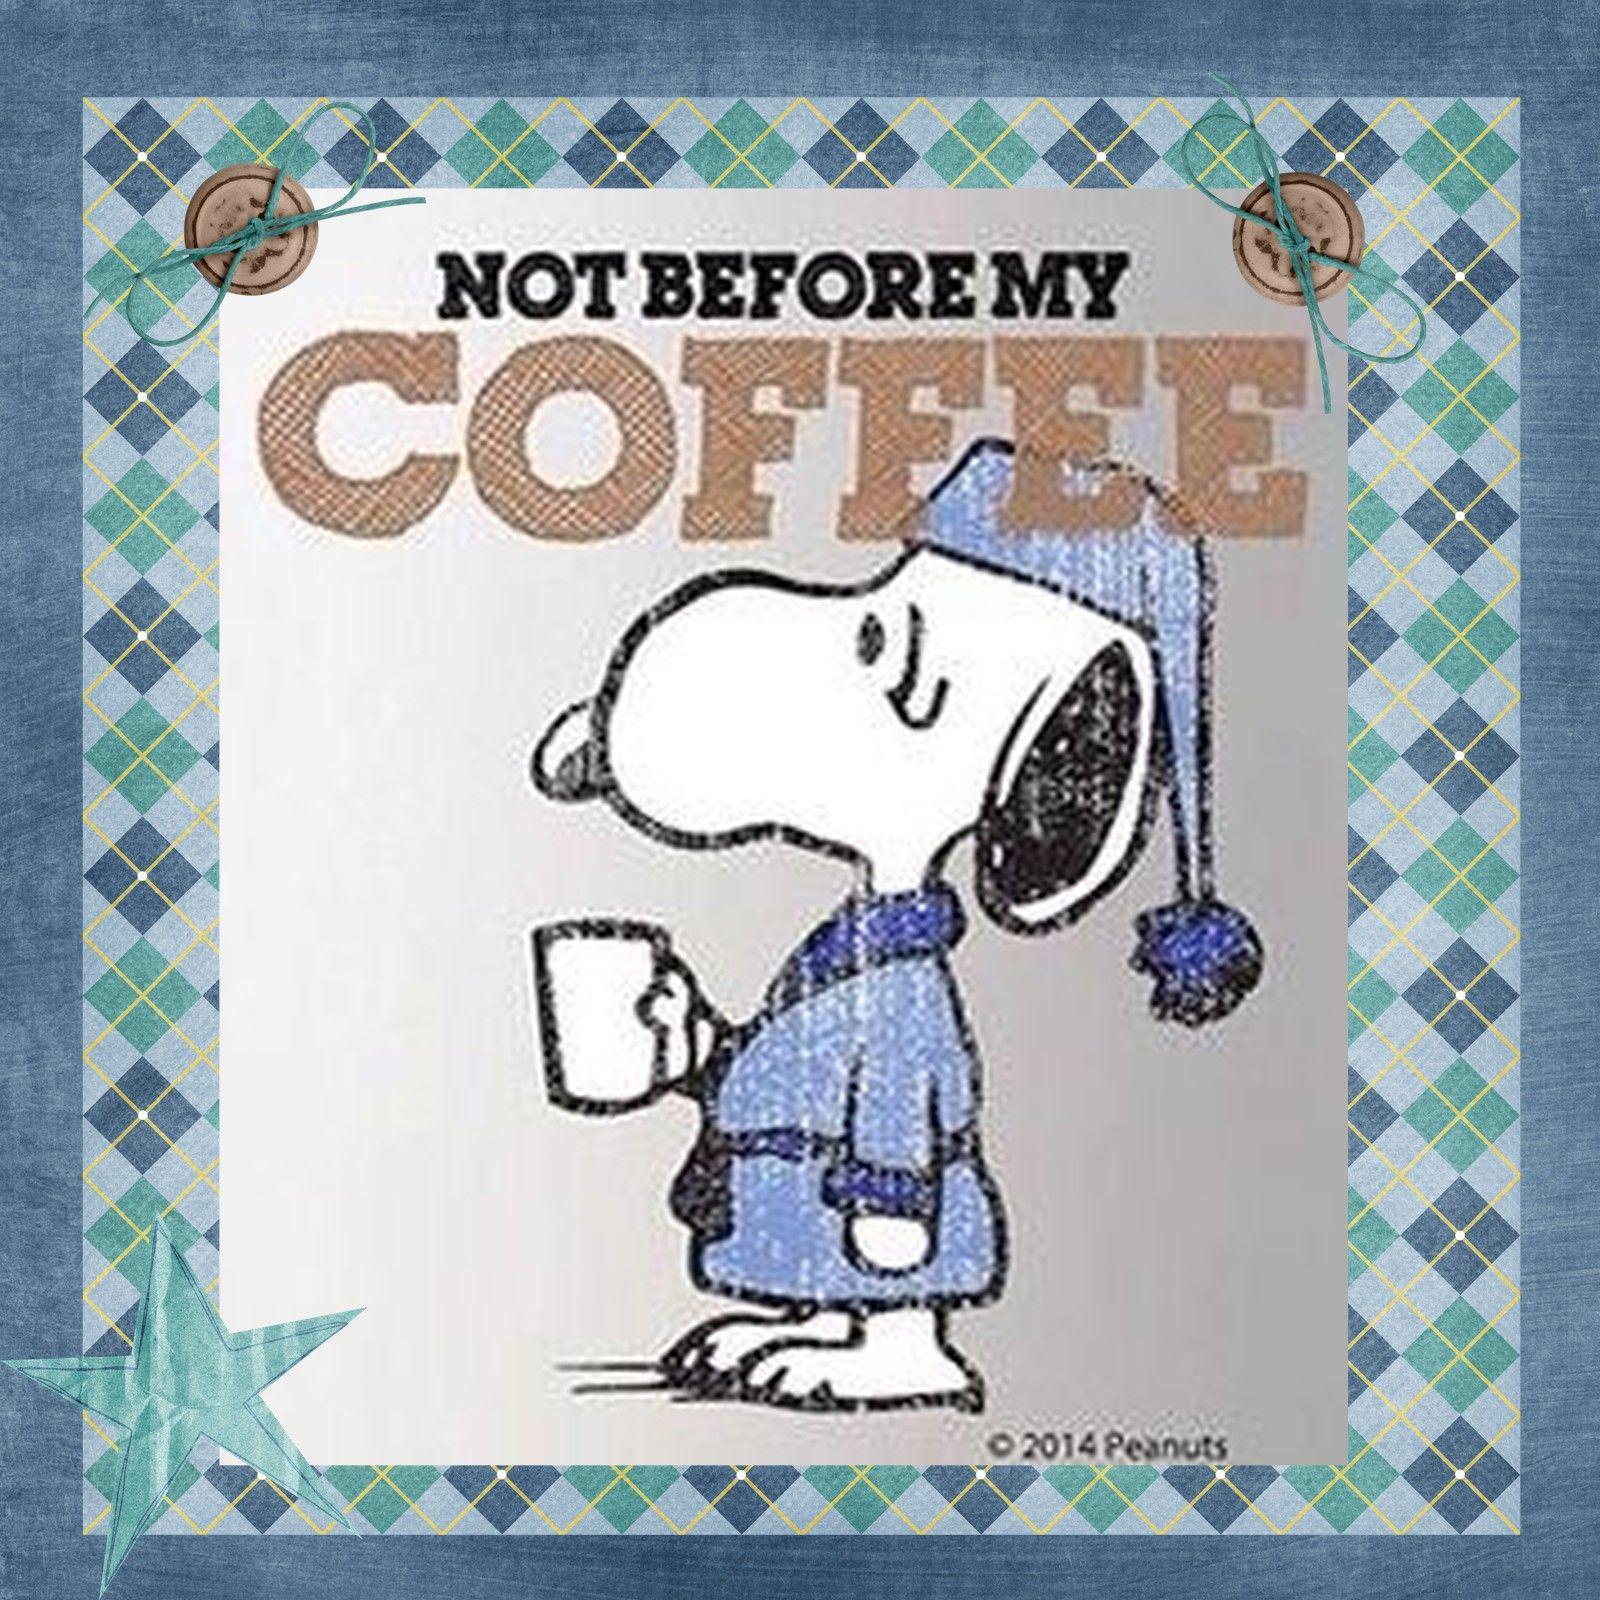 Snoopy not before my coffee snoopy pinterest guten - Liebling englisch ...